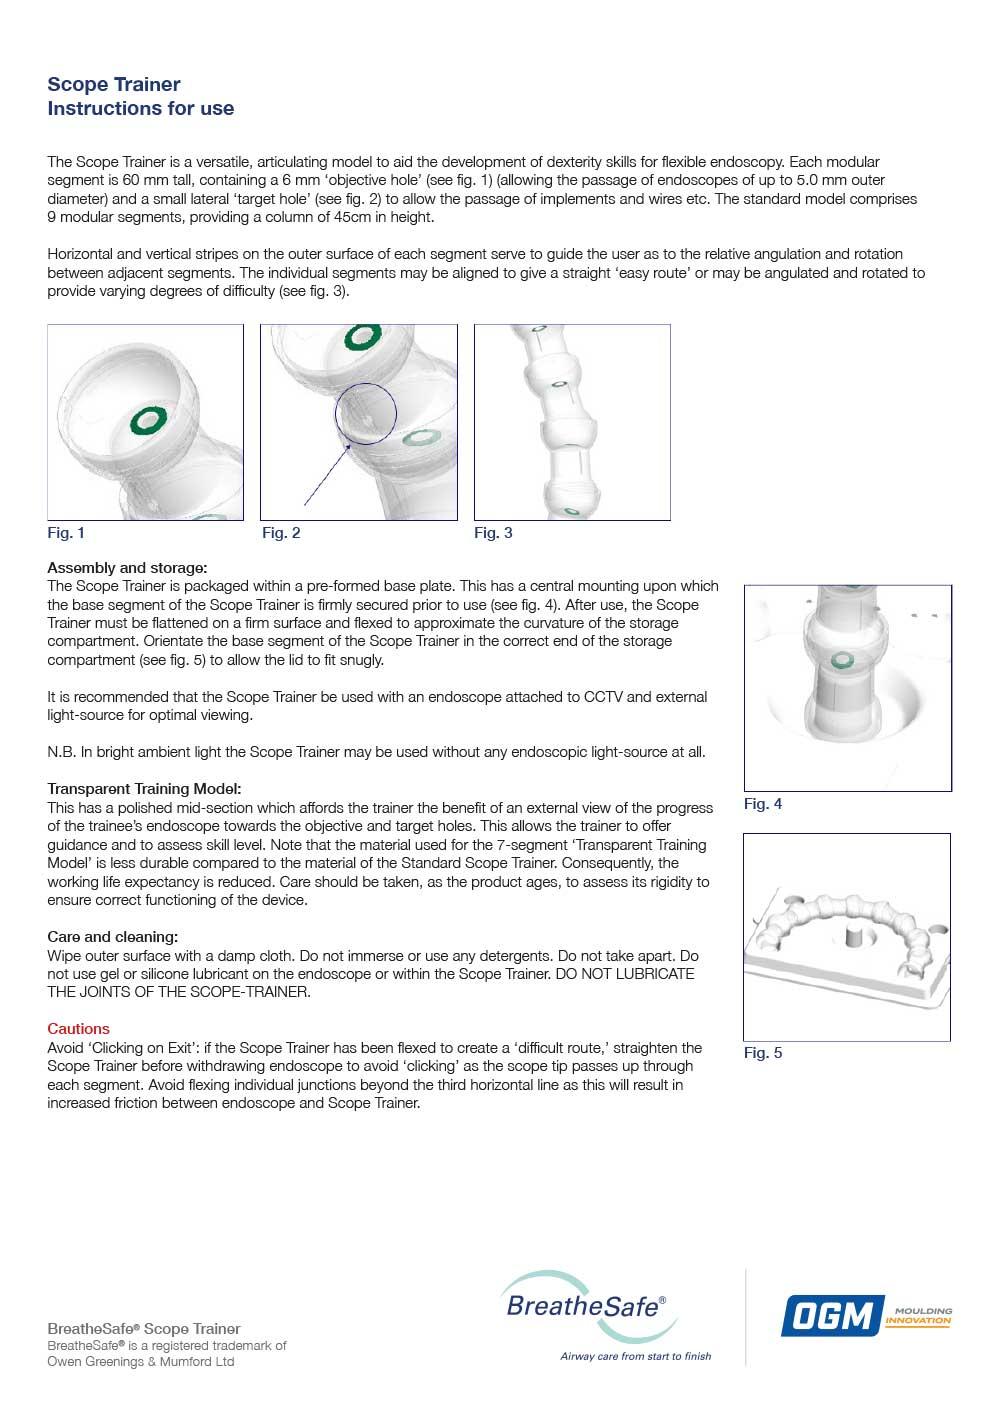 BiteBlock technical Specifications